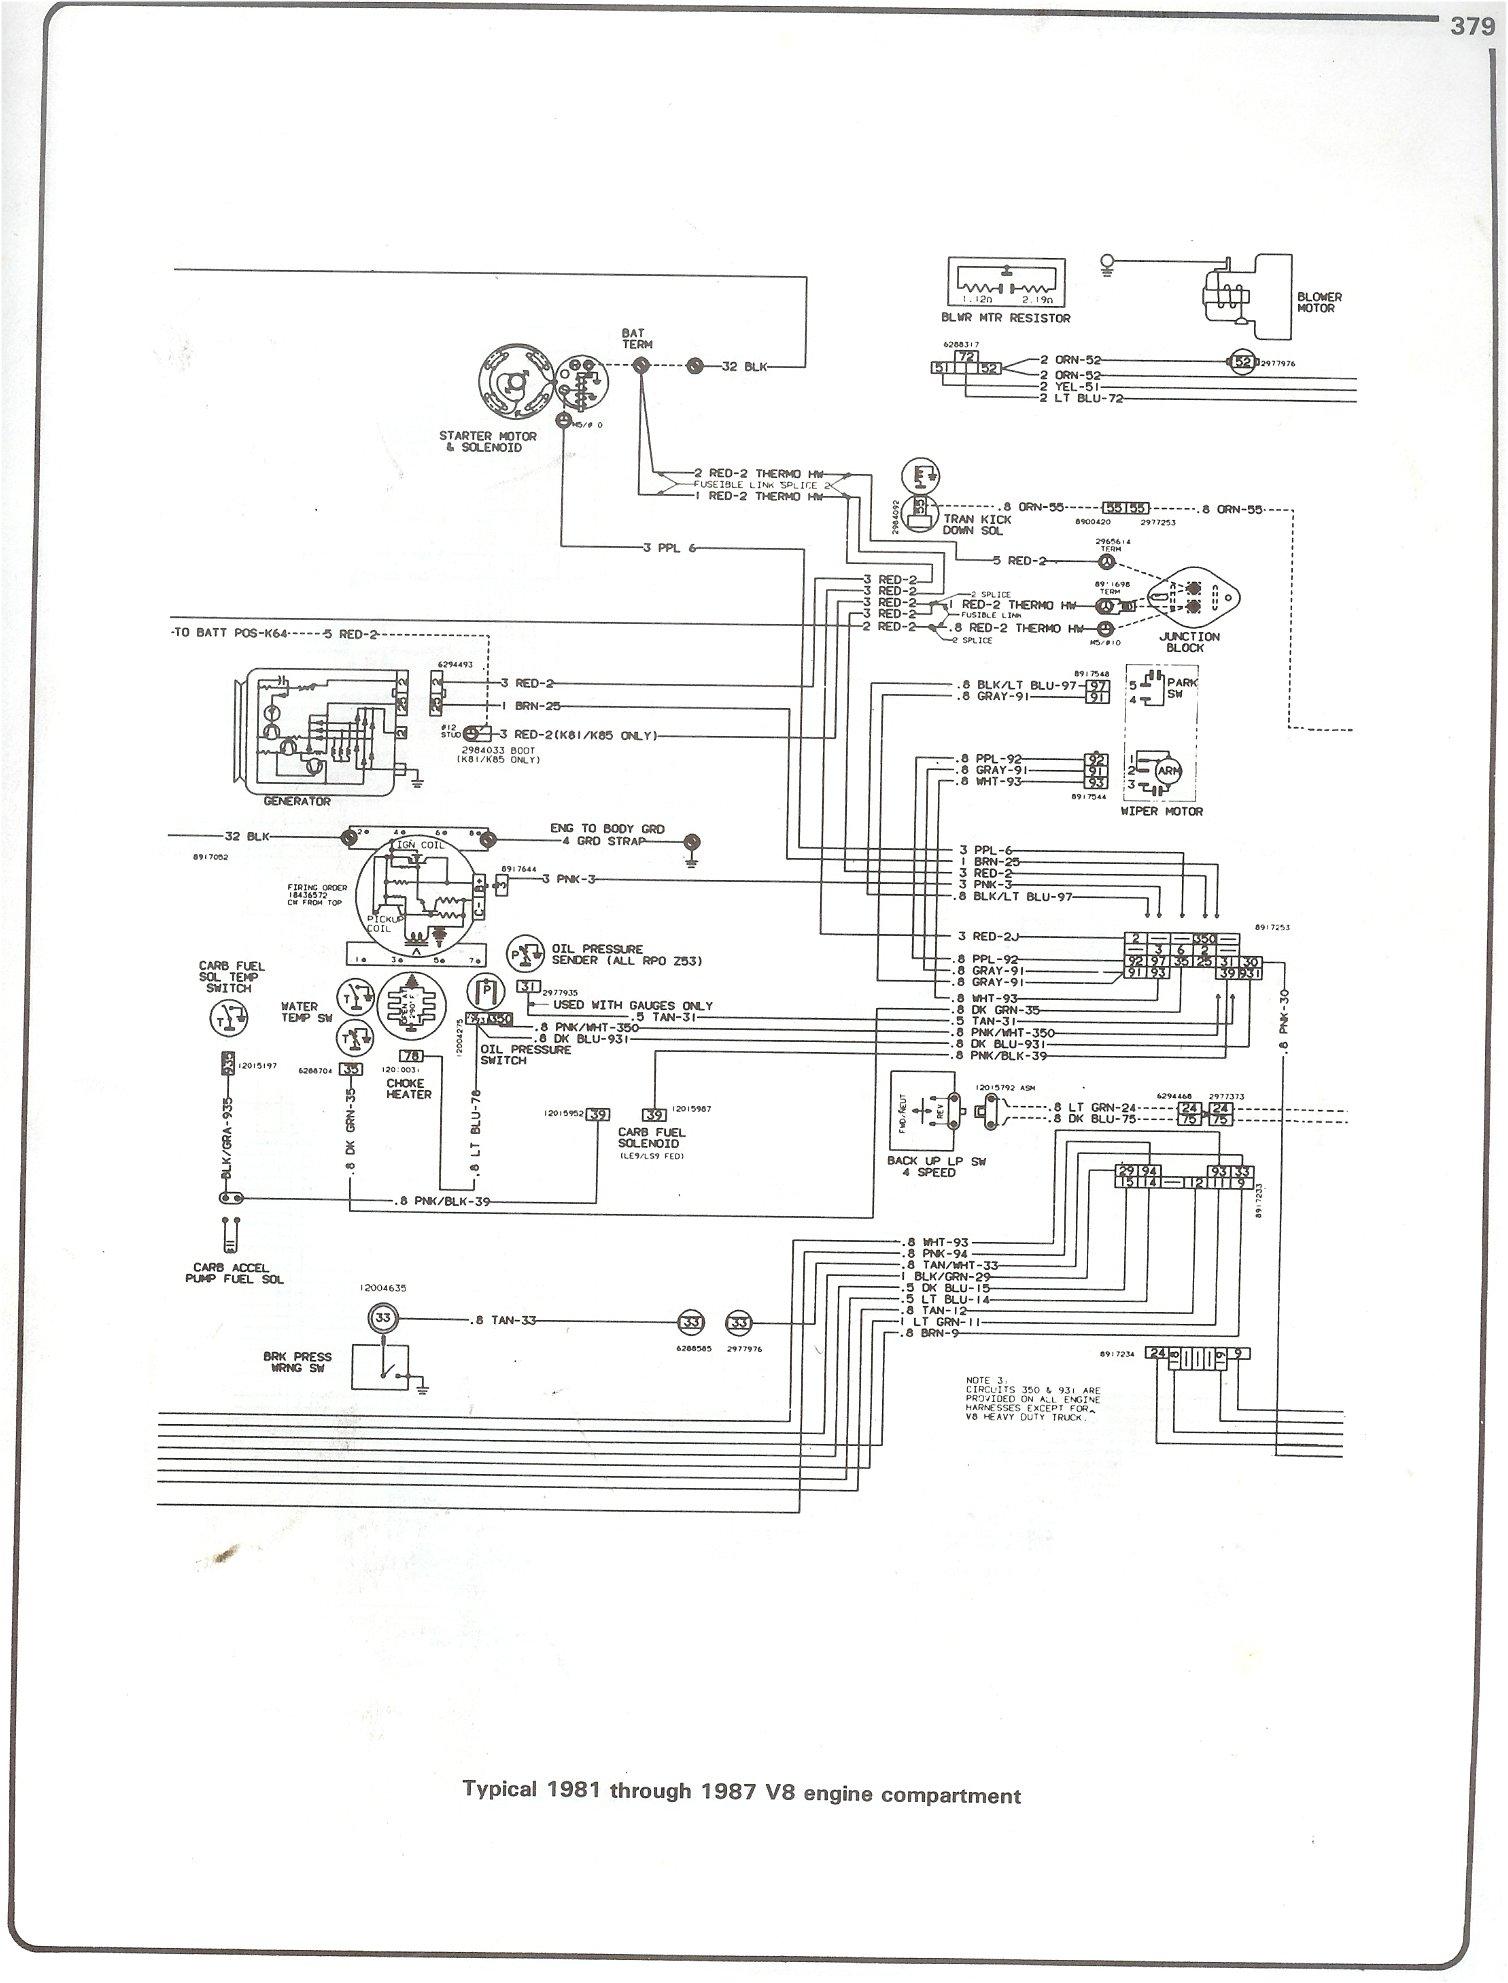 Super 79 Blazer Wiring Diagram Wiring Diagram Database Wiring Cloud Grayisramohammedshrineorg